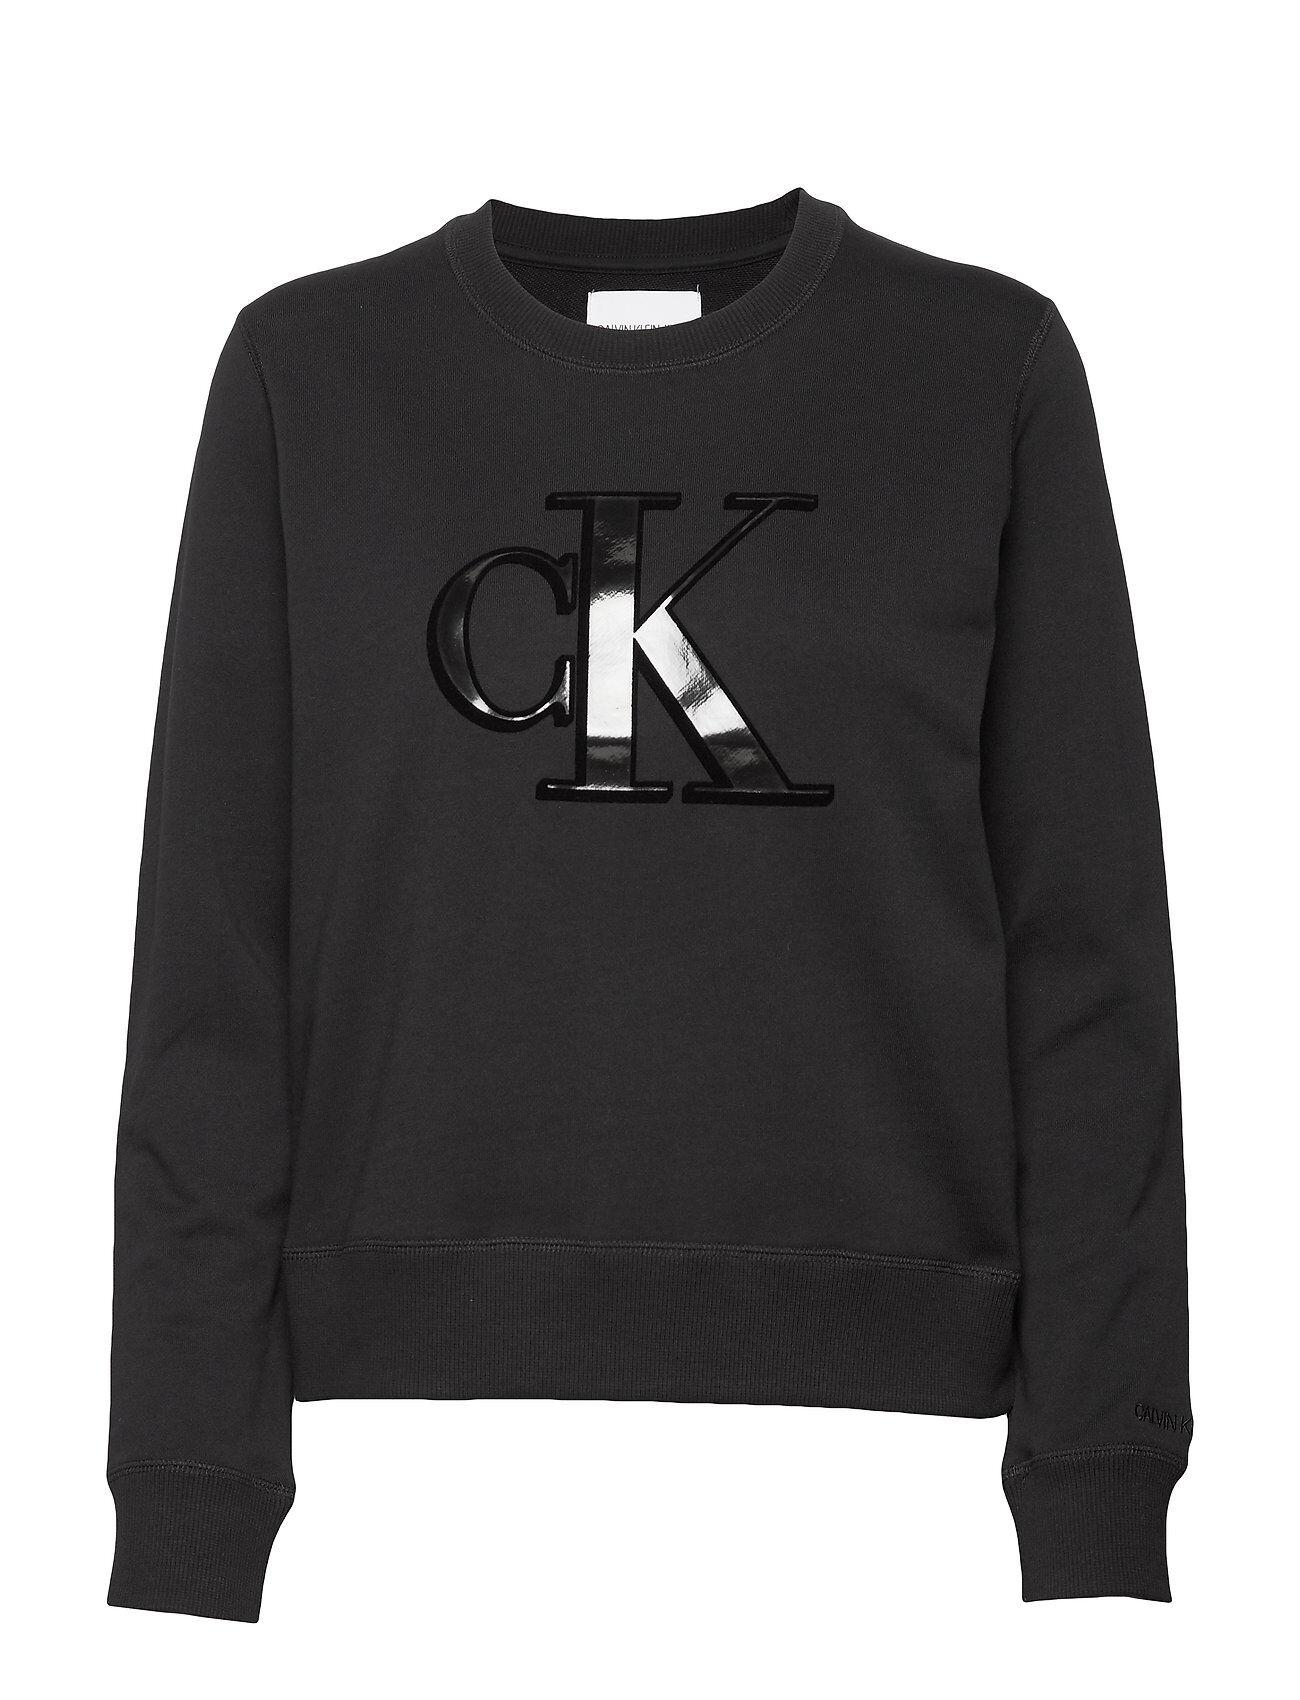 Image of Calvin Flock Monogram Ck Regular Cn Svetari Collegepaita Musta Calvin Klein Jeans